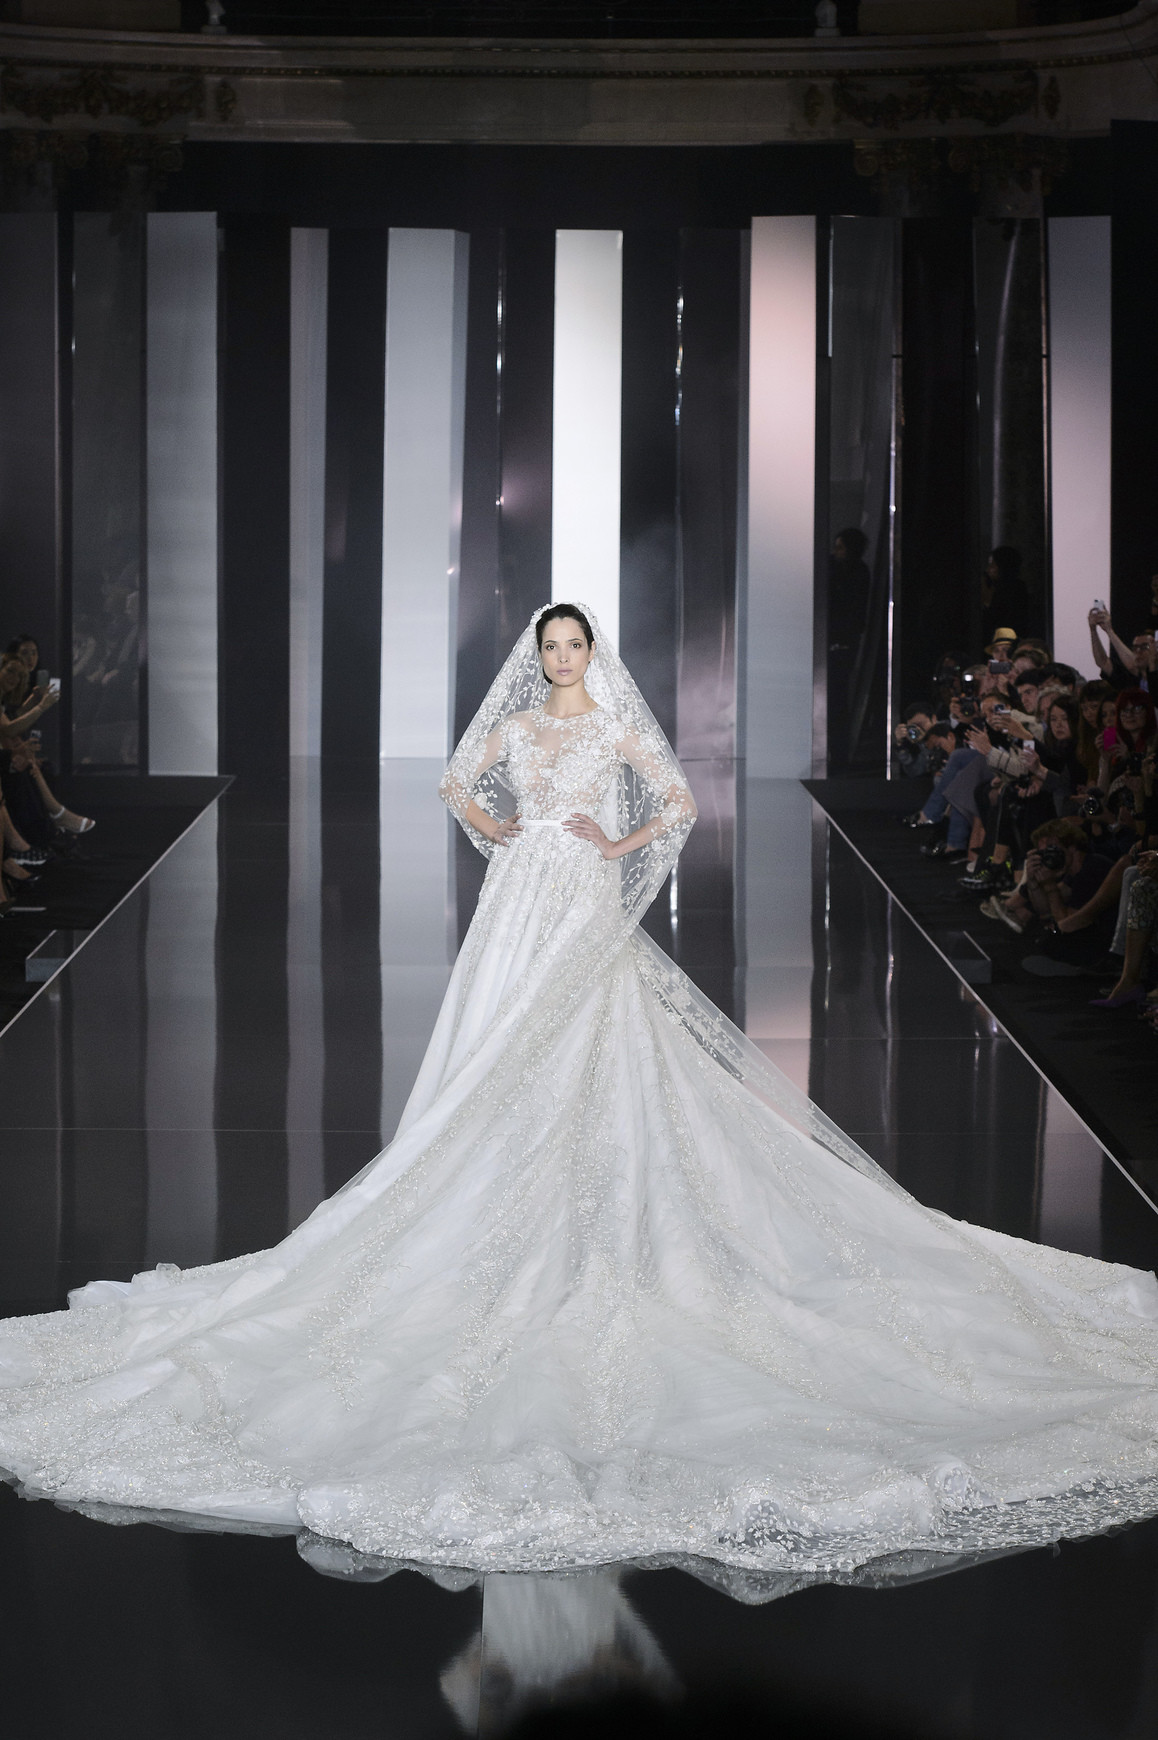 18 Ralph & Russo dresses to inspire Meghan Markle's wedding dress